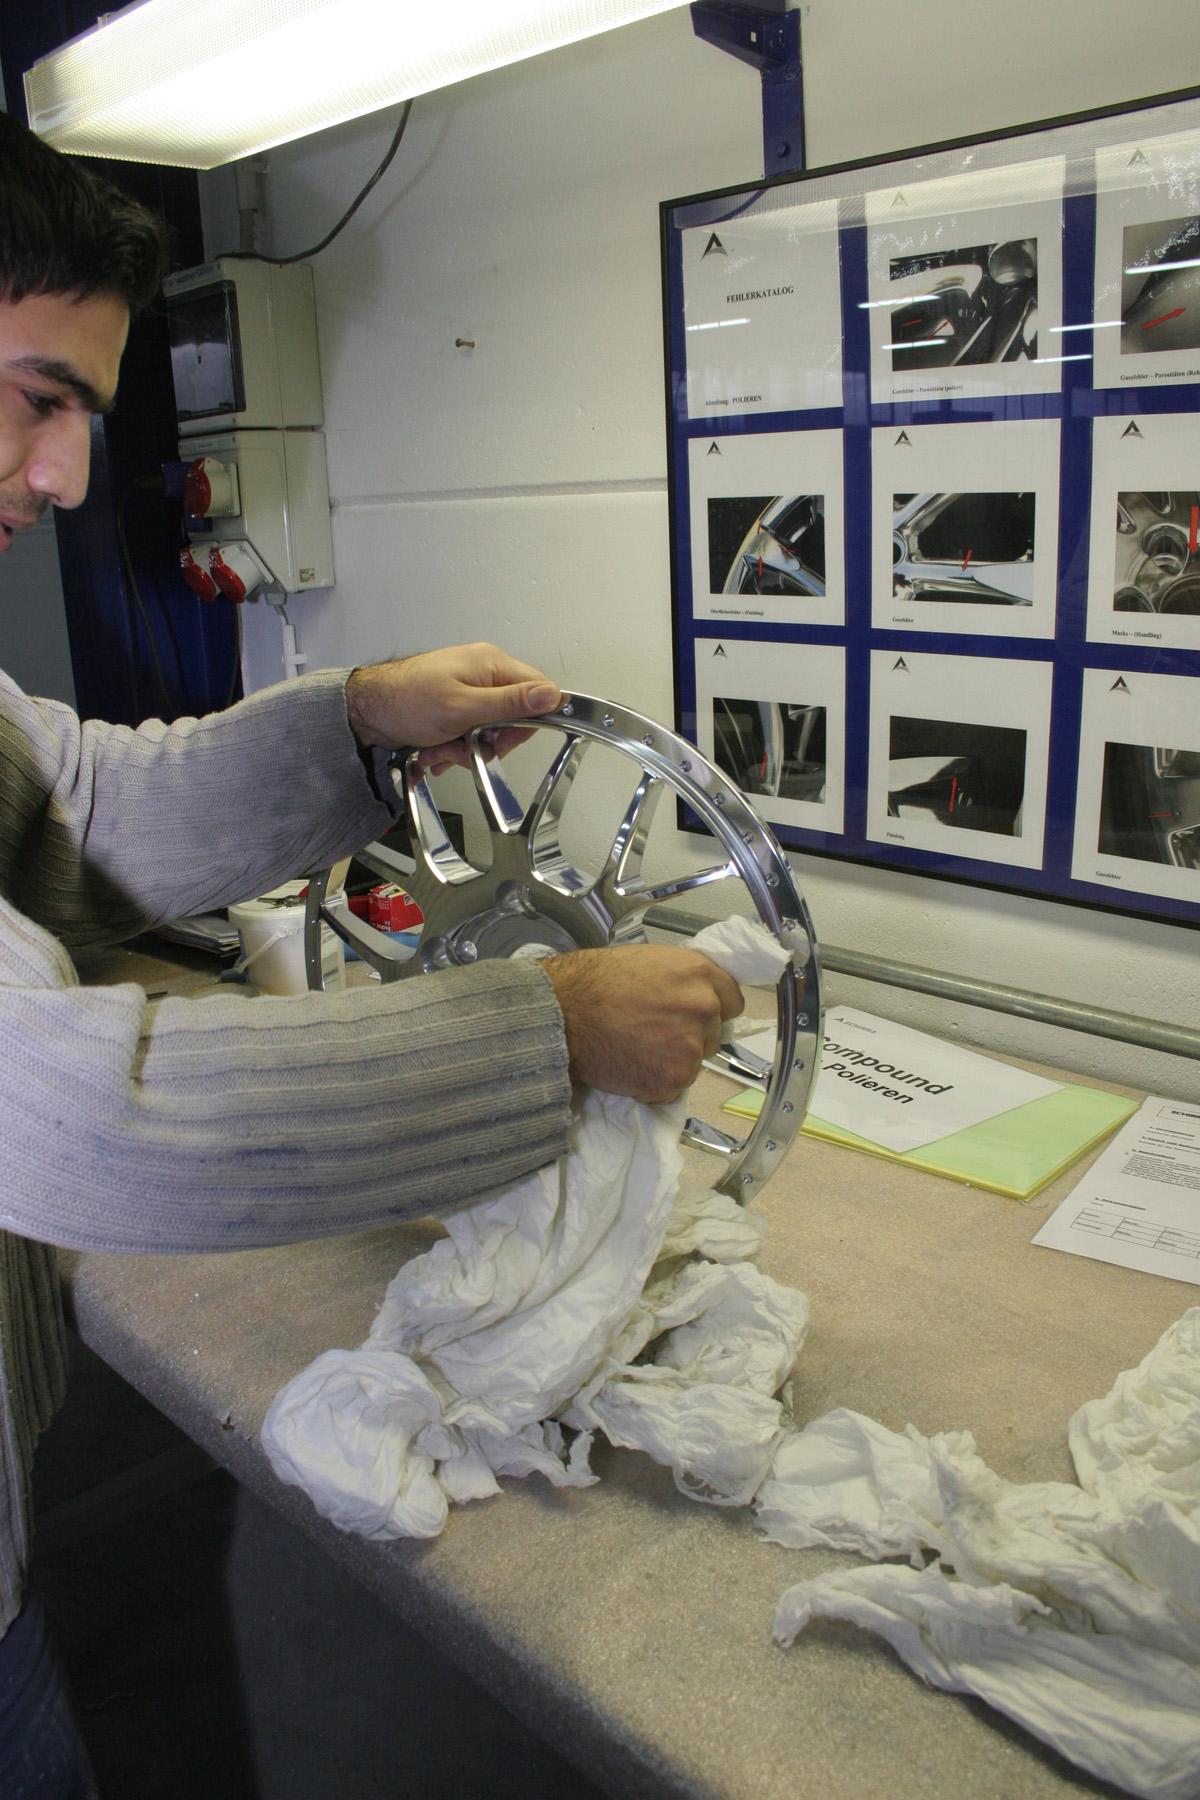 Construccion Llantas Tuning/Tuning Wheel Construction-Cargraphic_Handpolitur_kl.jpg